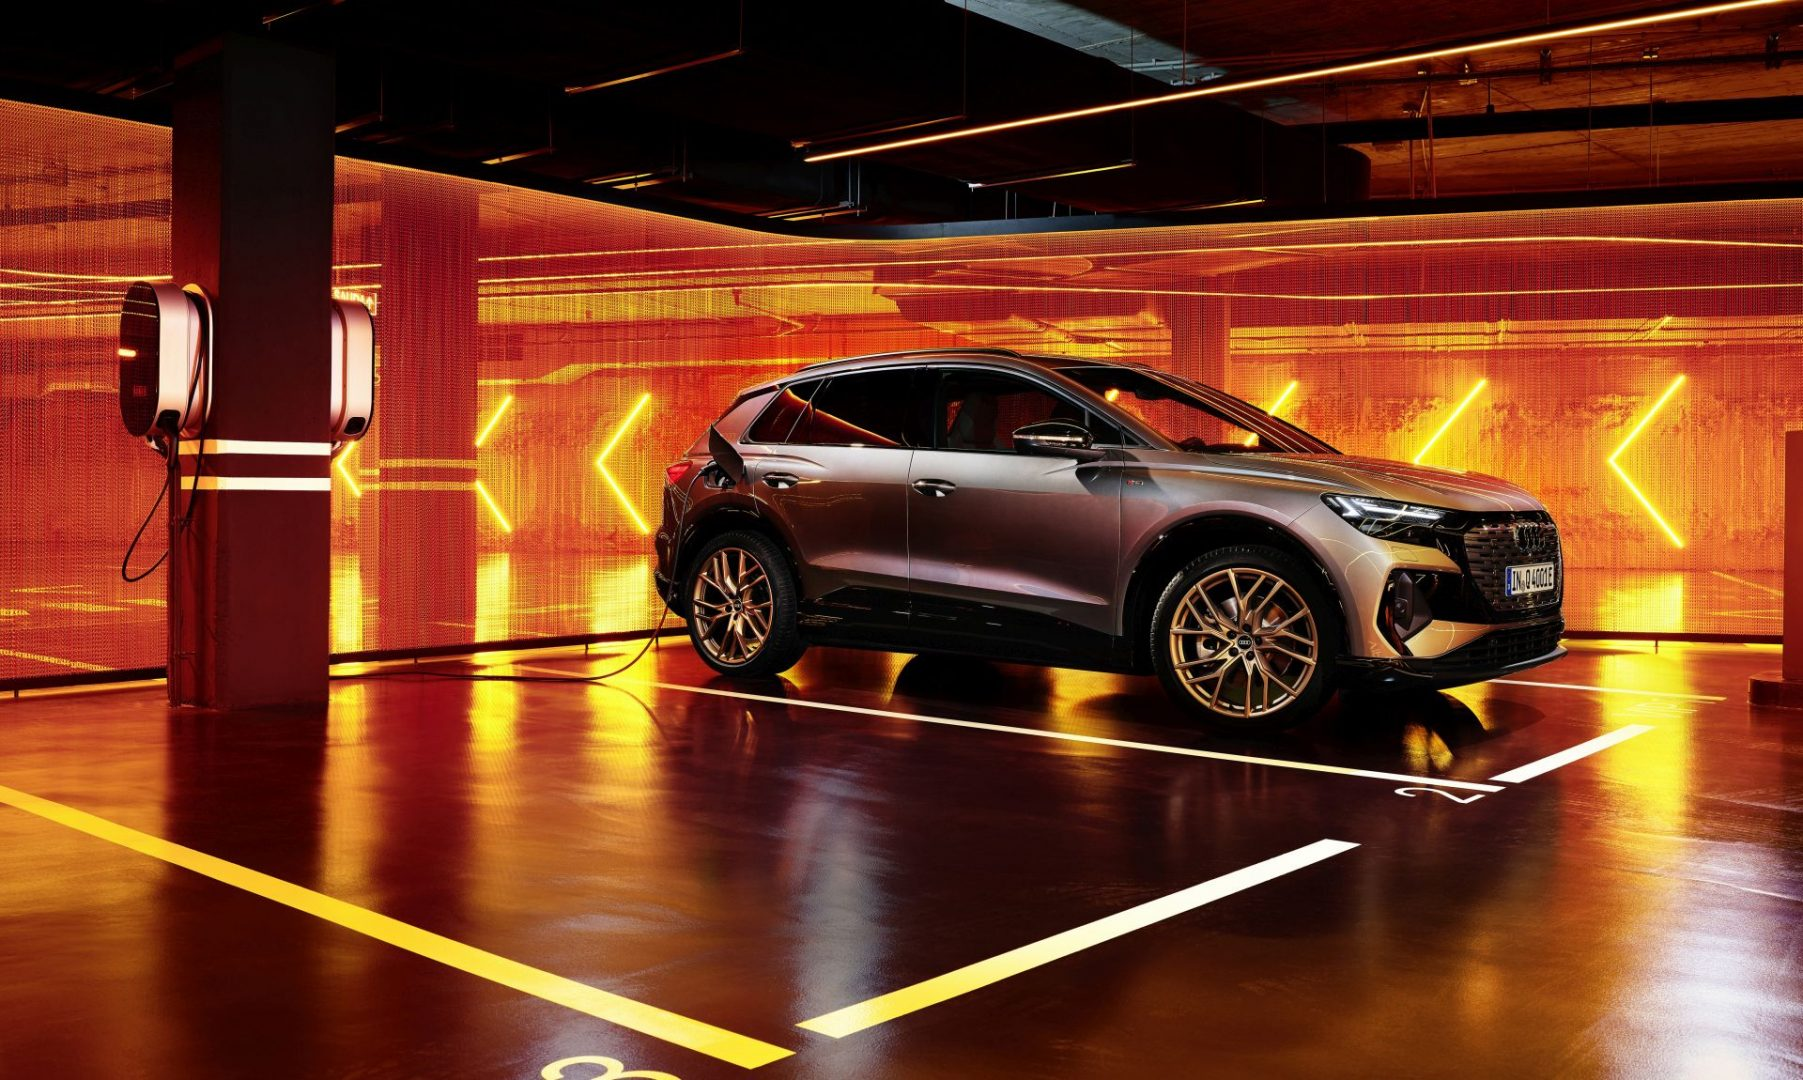 Audi predstavio dva električna SUV-a: Q4 e-tron i Q4 e-tron Sportback